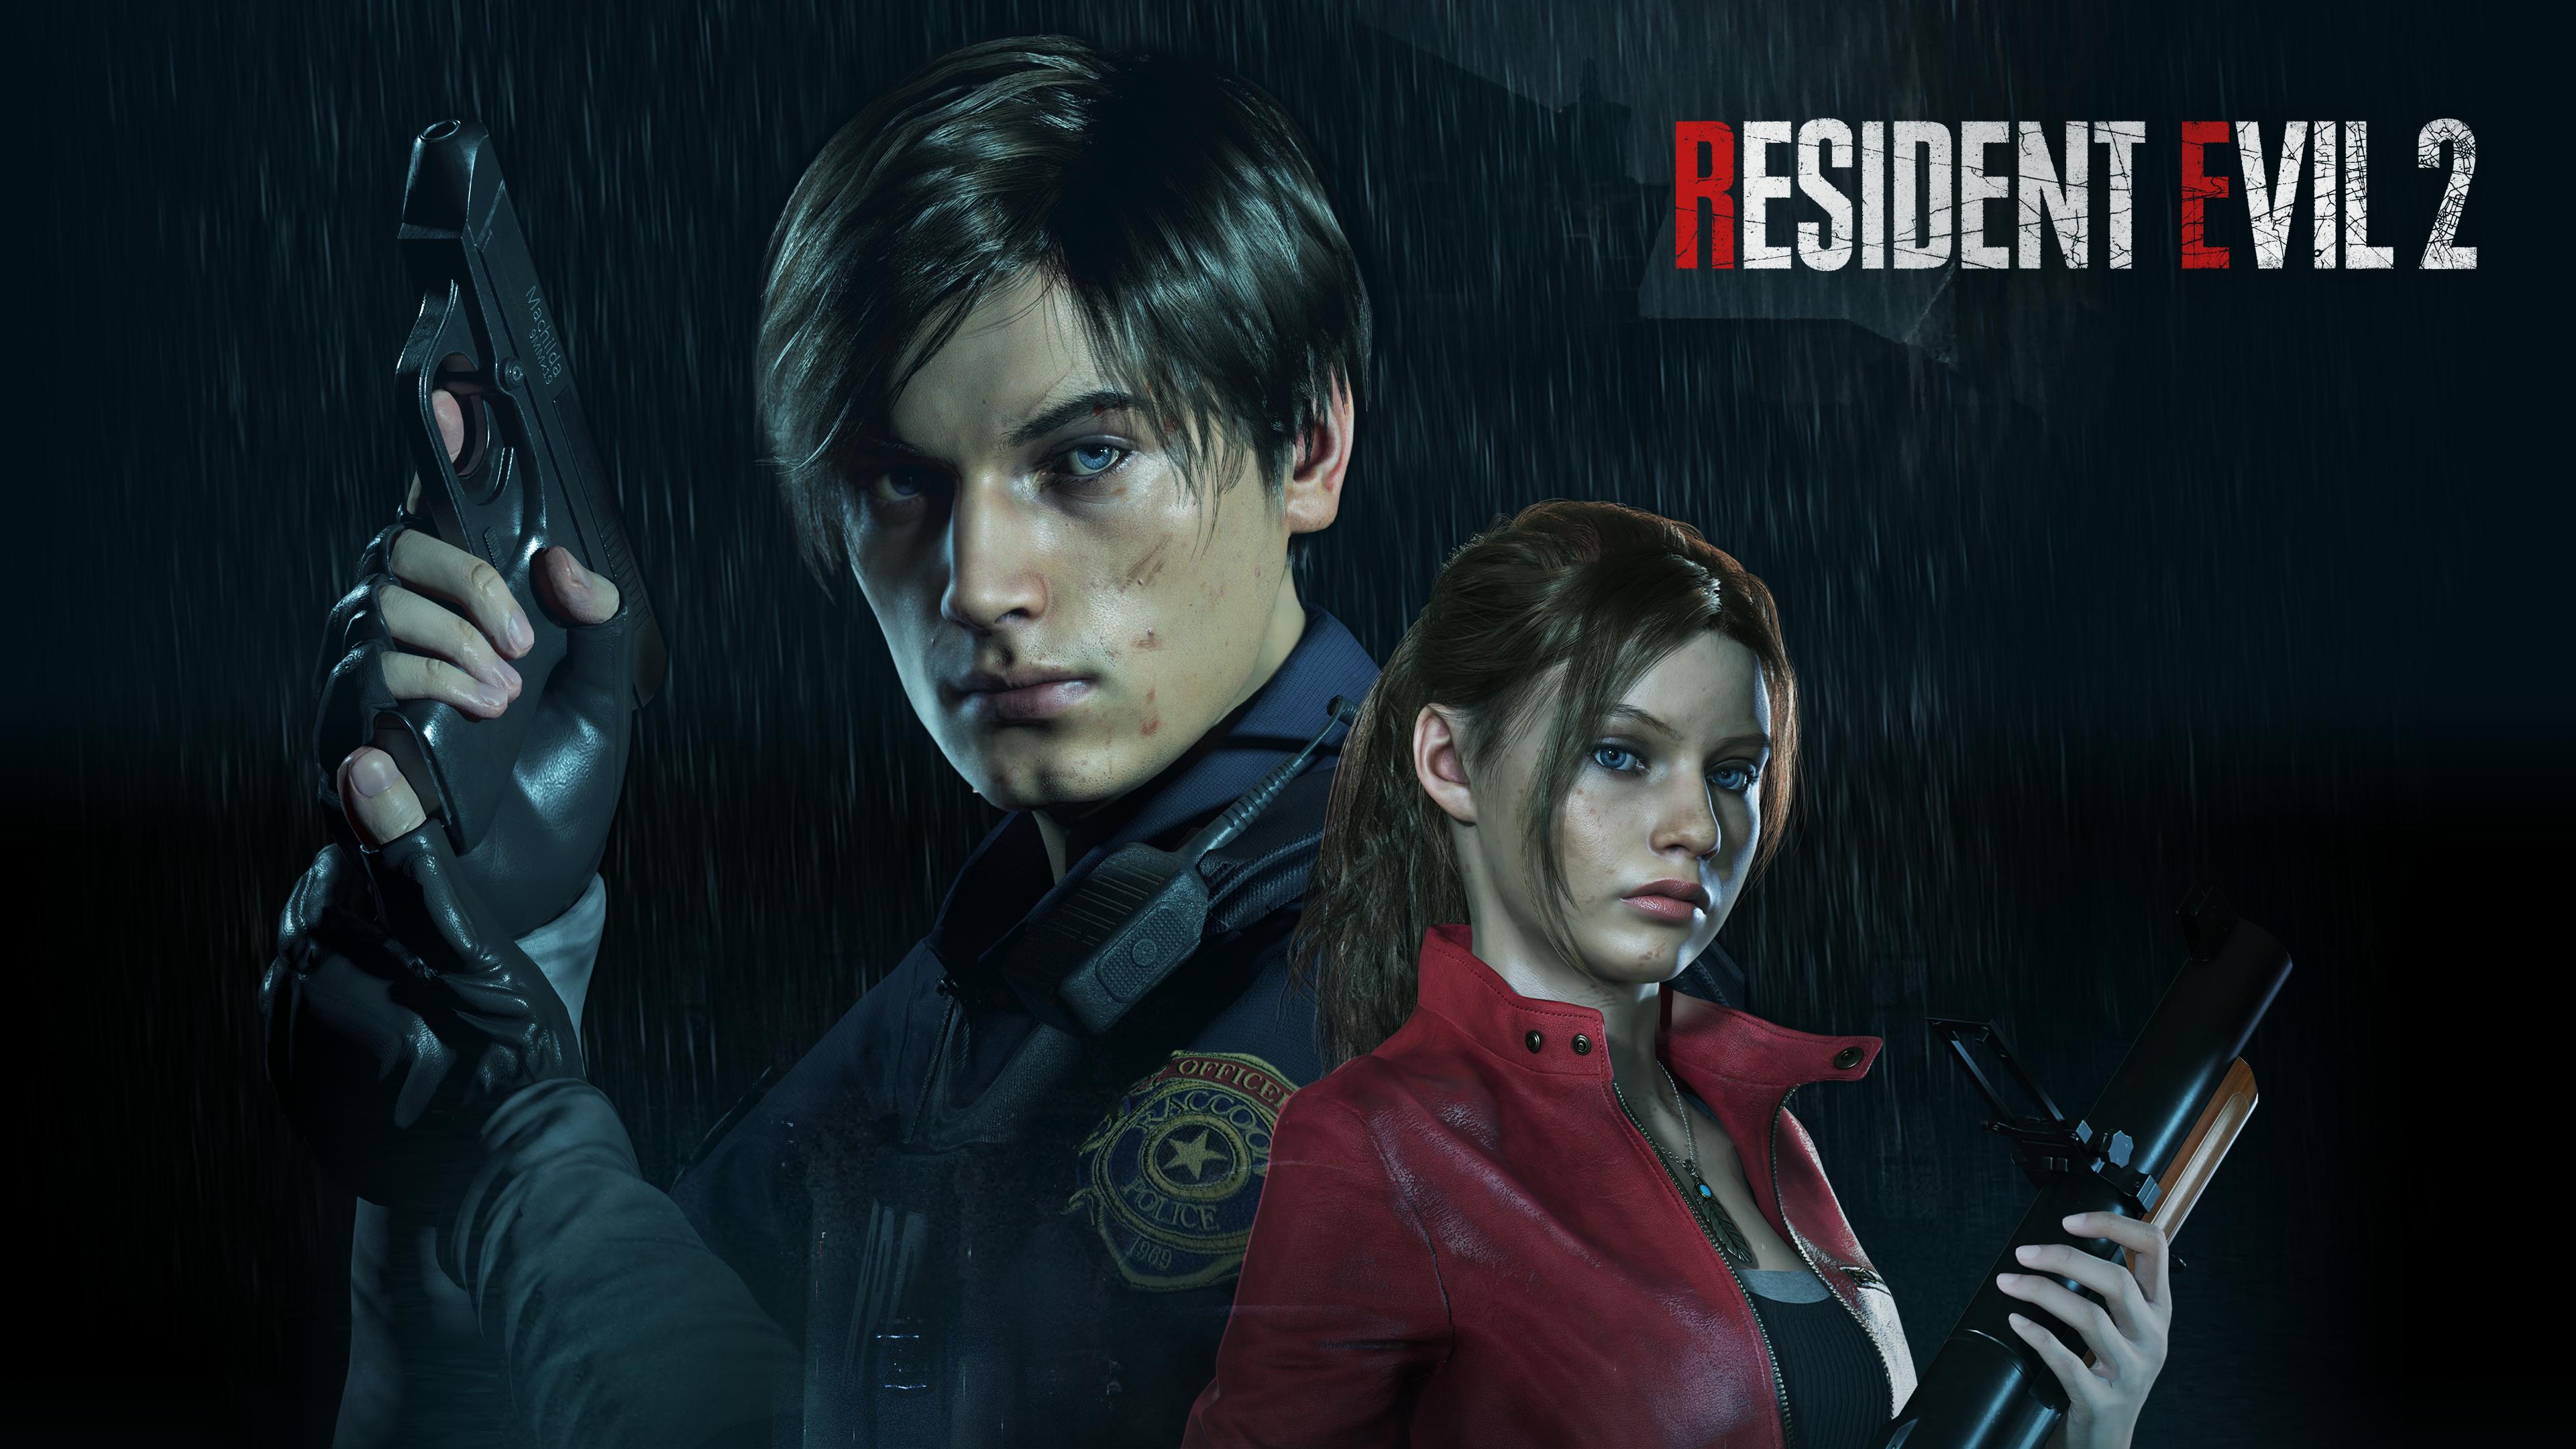 Resident Evil 2 2019 4k Ultra Hd Wallpaper Background Image